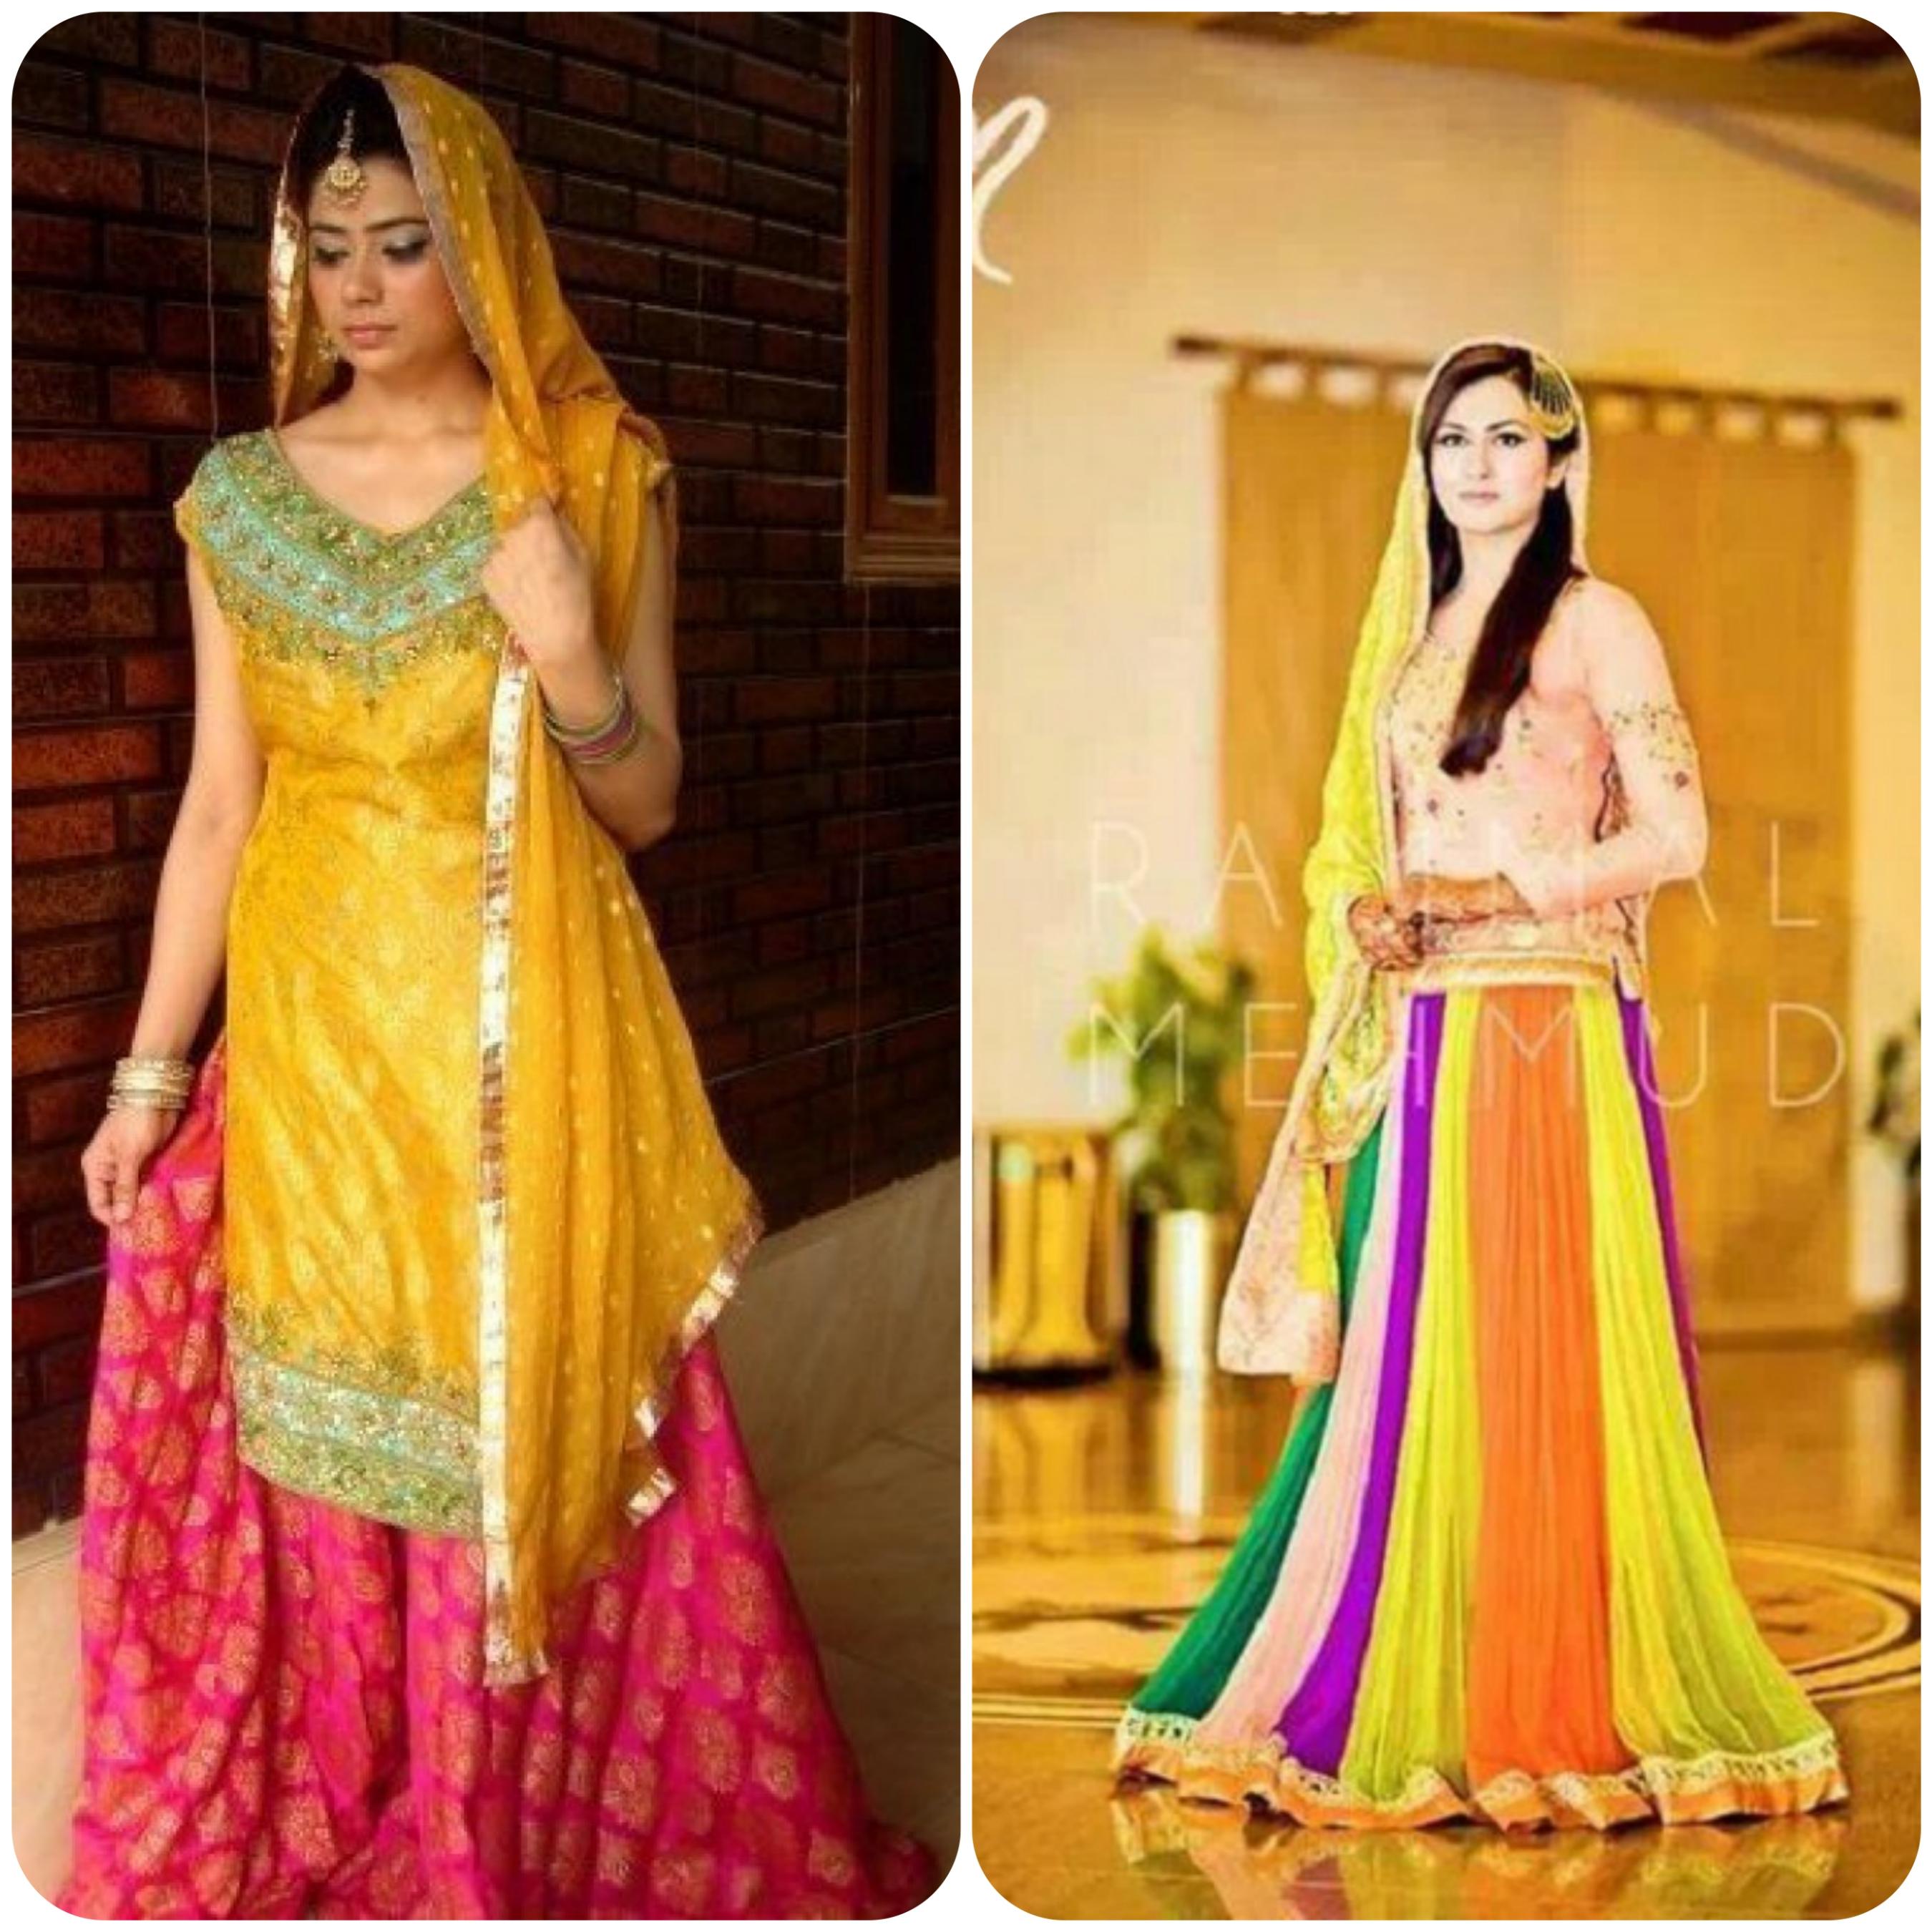 3a9ea368bd56 latest bridal mehndi dresses 9 styloplanet .com